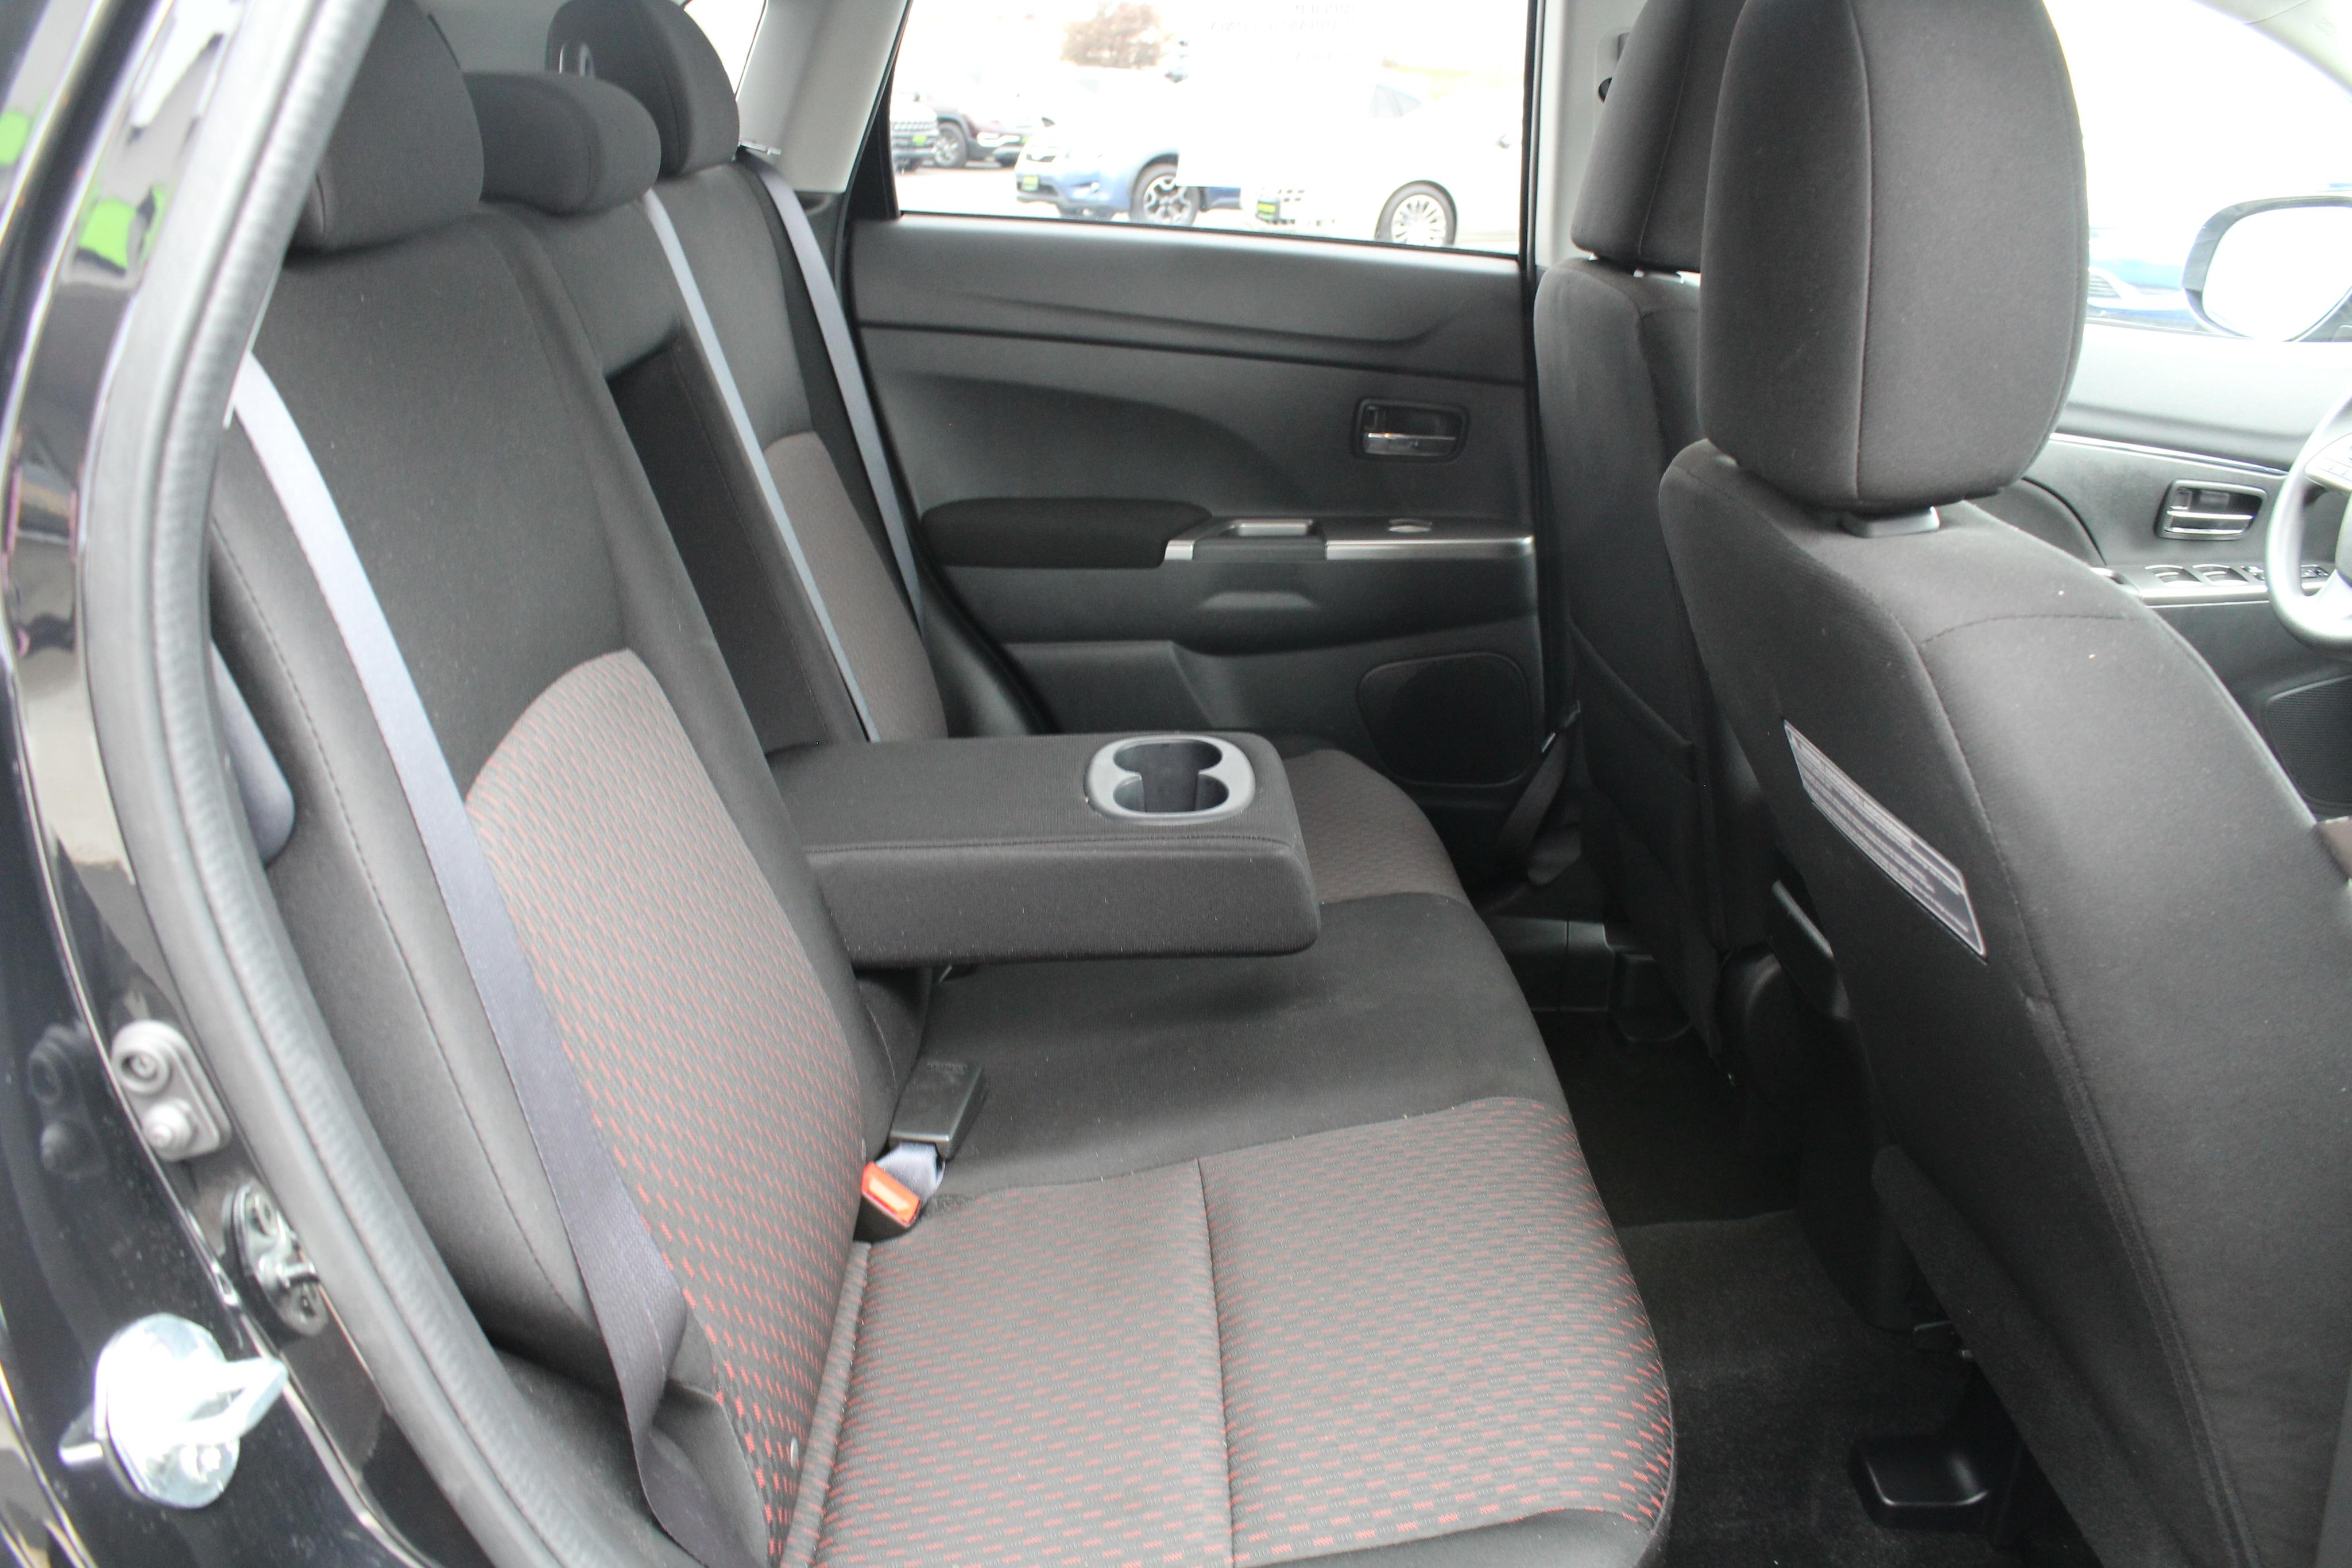 2018 Mitsubishi Outlander Sport Wagon 4 Dr.